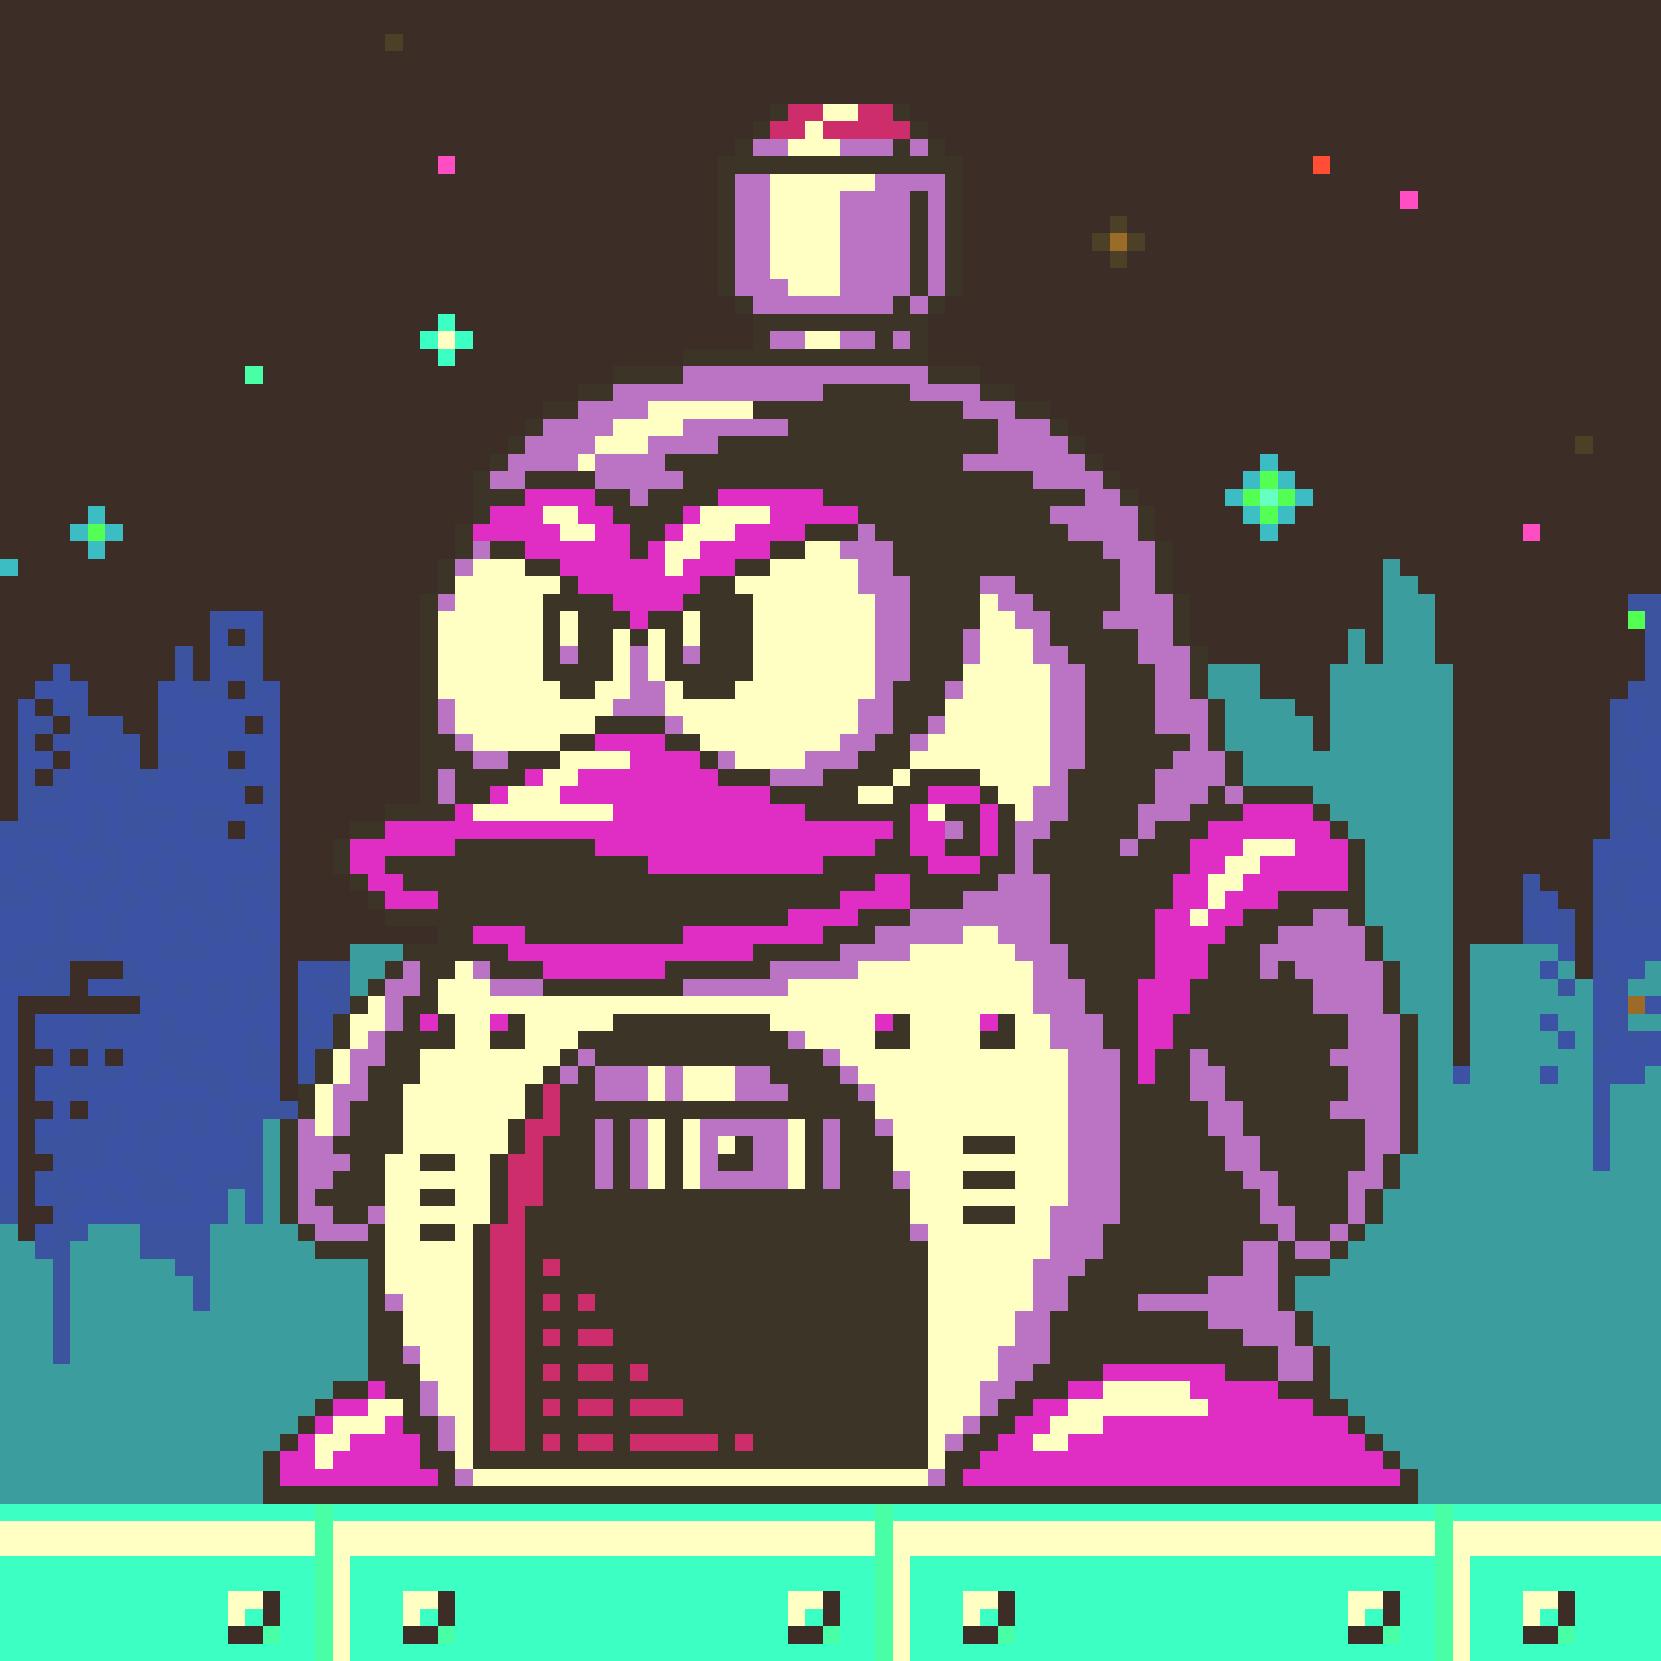 mega-man-robot-penguin.png